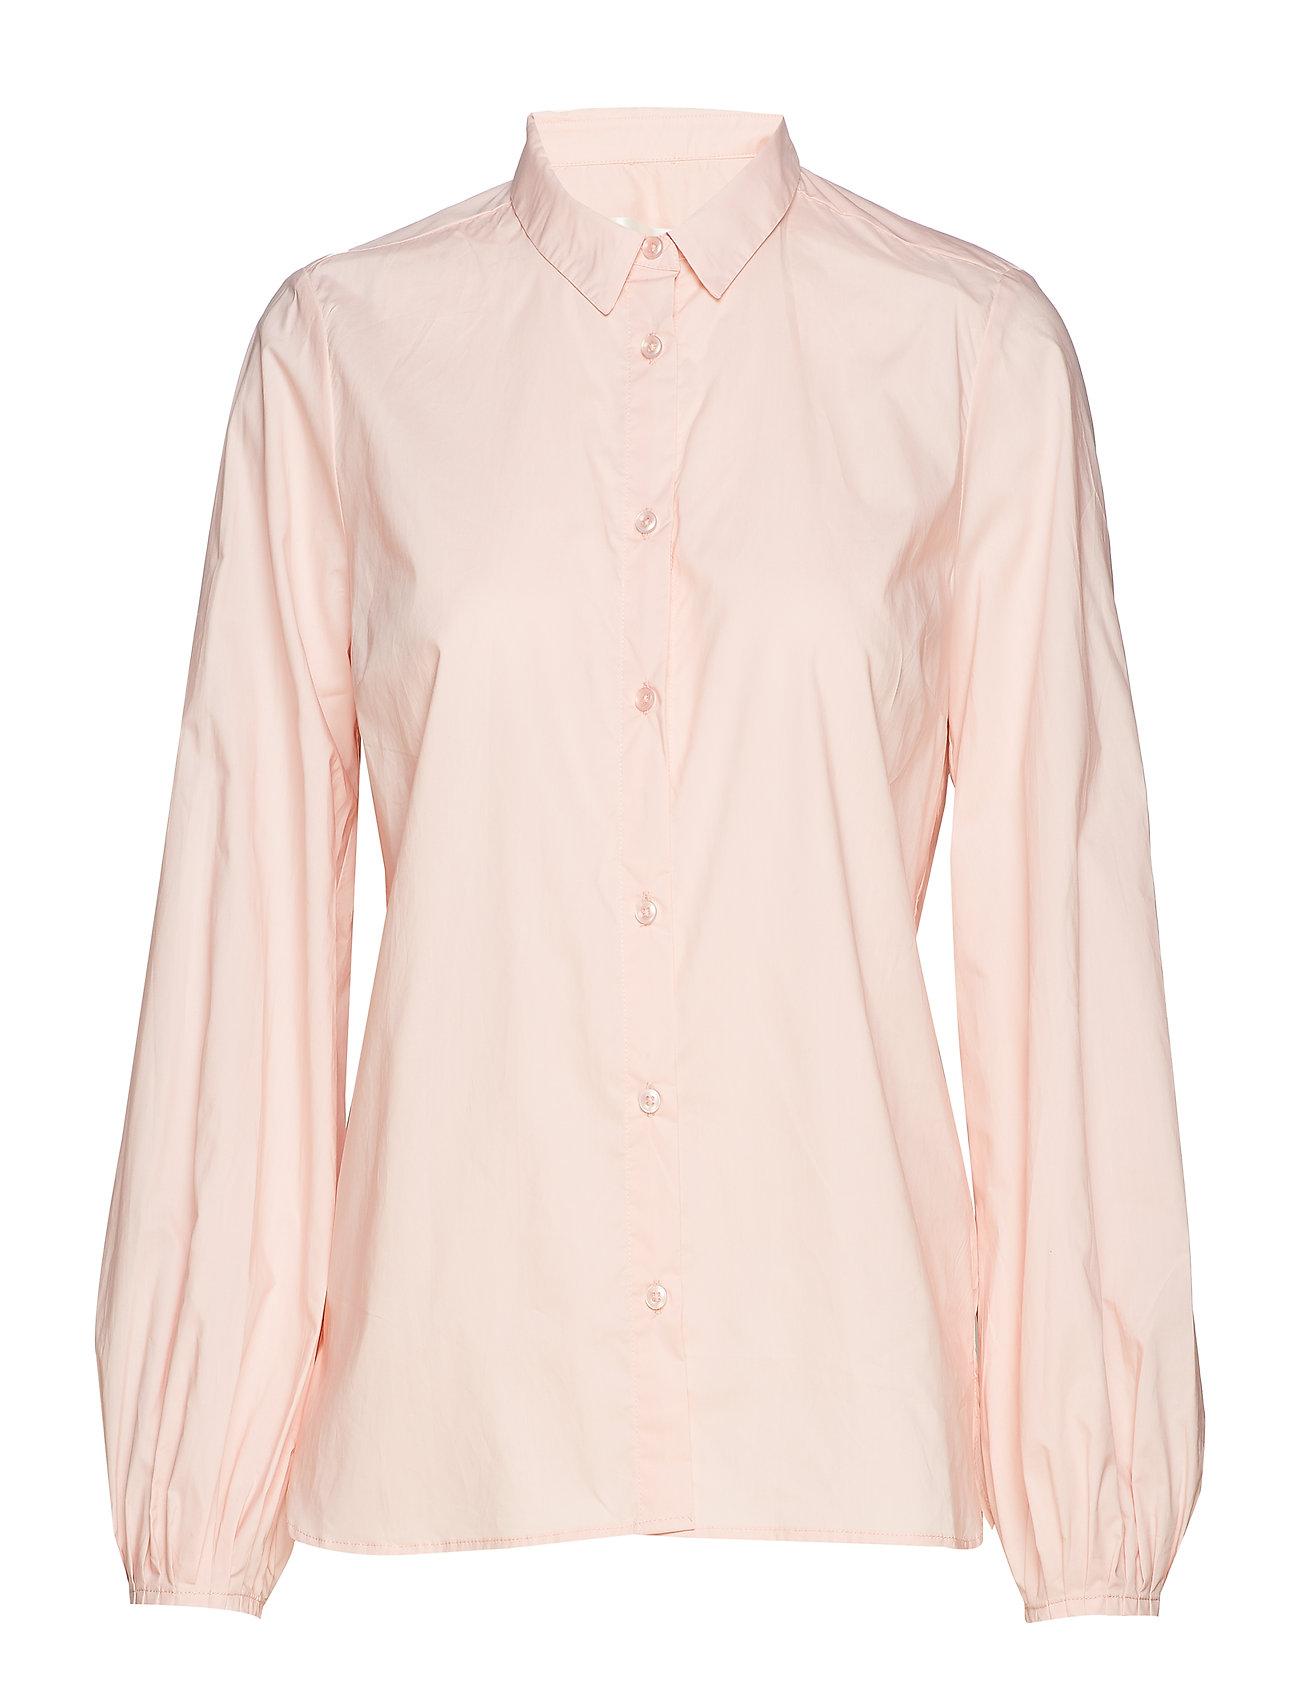 InWear Naila Shirt - ROSE QUARTZ